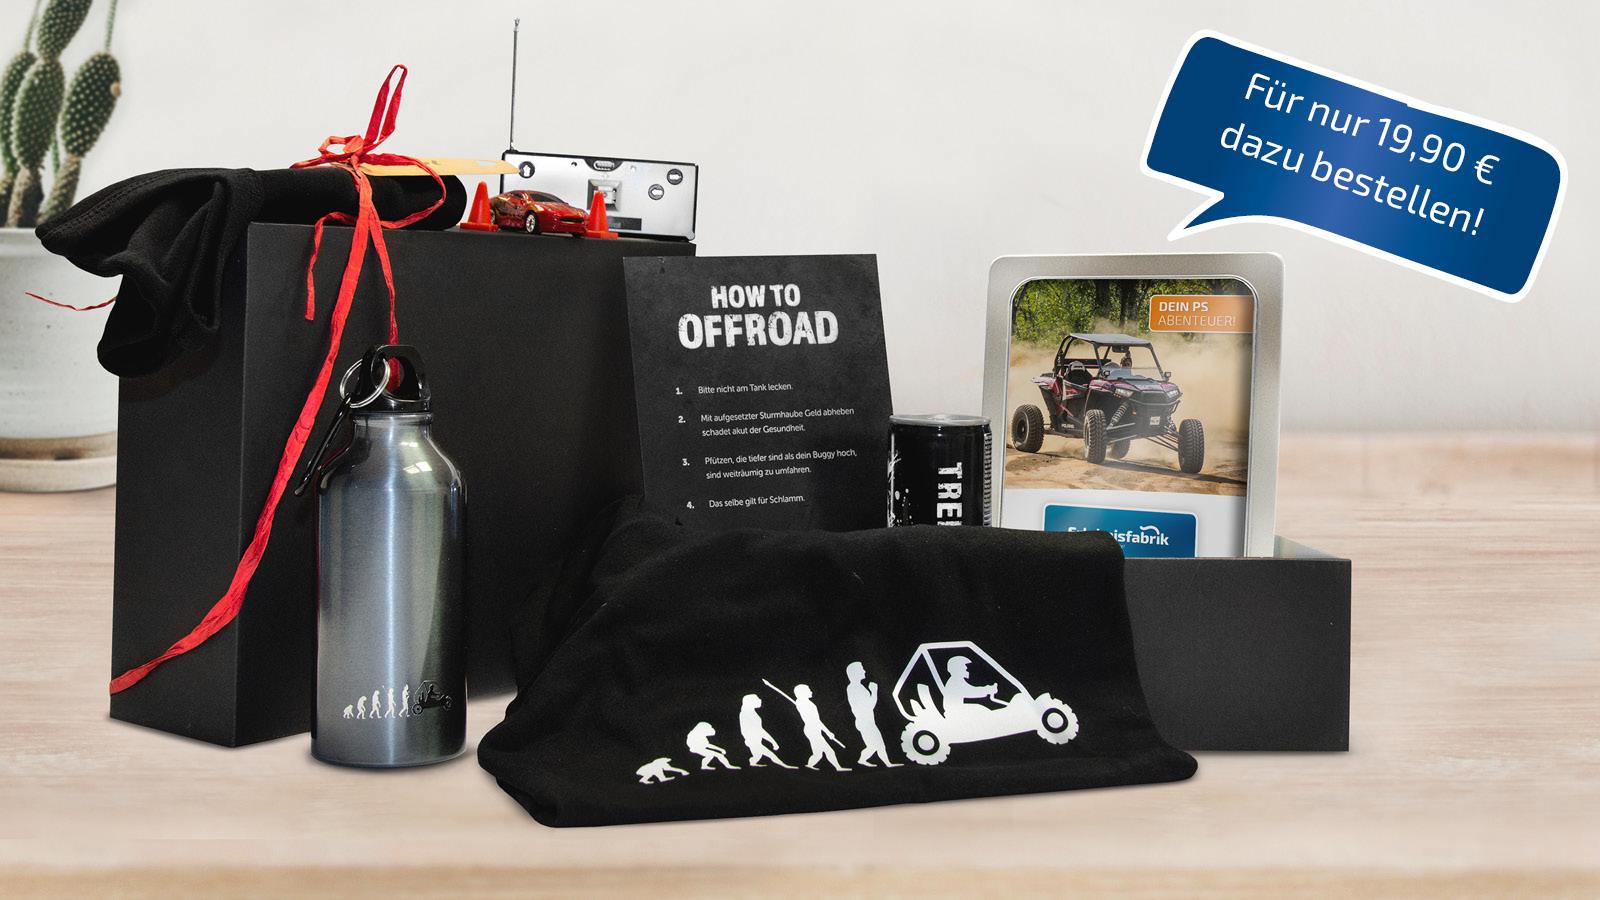 Strassen Buggy Ness Fahren Bei Leipzig Erlebnisfabrik Erlebnisfabrik